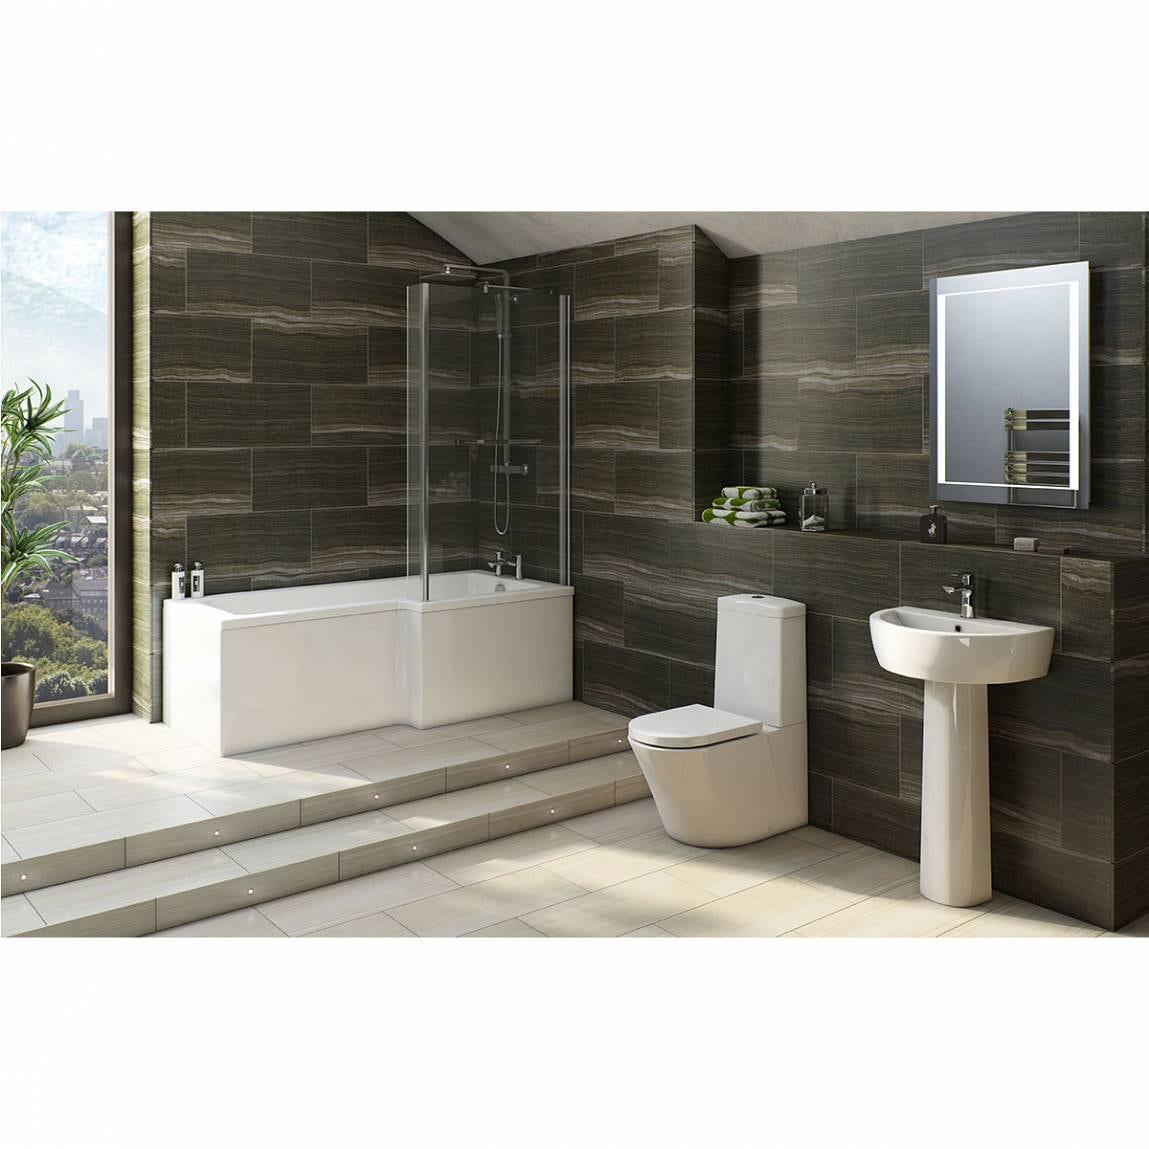 Plumbs bathroom suites - Arte Bathroom Suite With Boston Shower Bath Rh 1700x850 Victoriaplum Arte Bathroom Suite With Boston Shower Bath Rh 1700x850 Victoriaplum Download